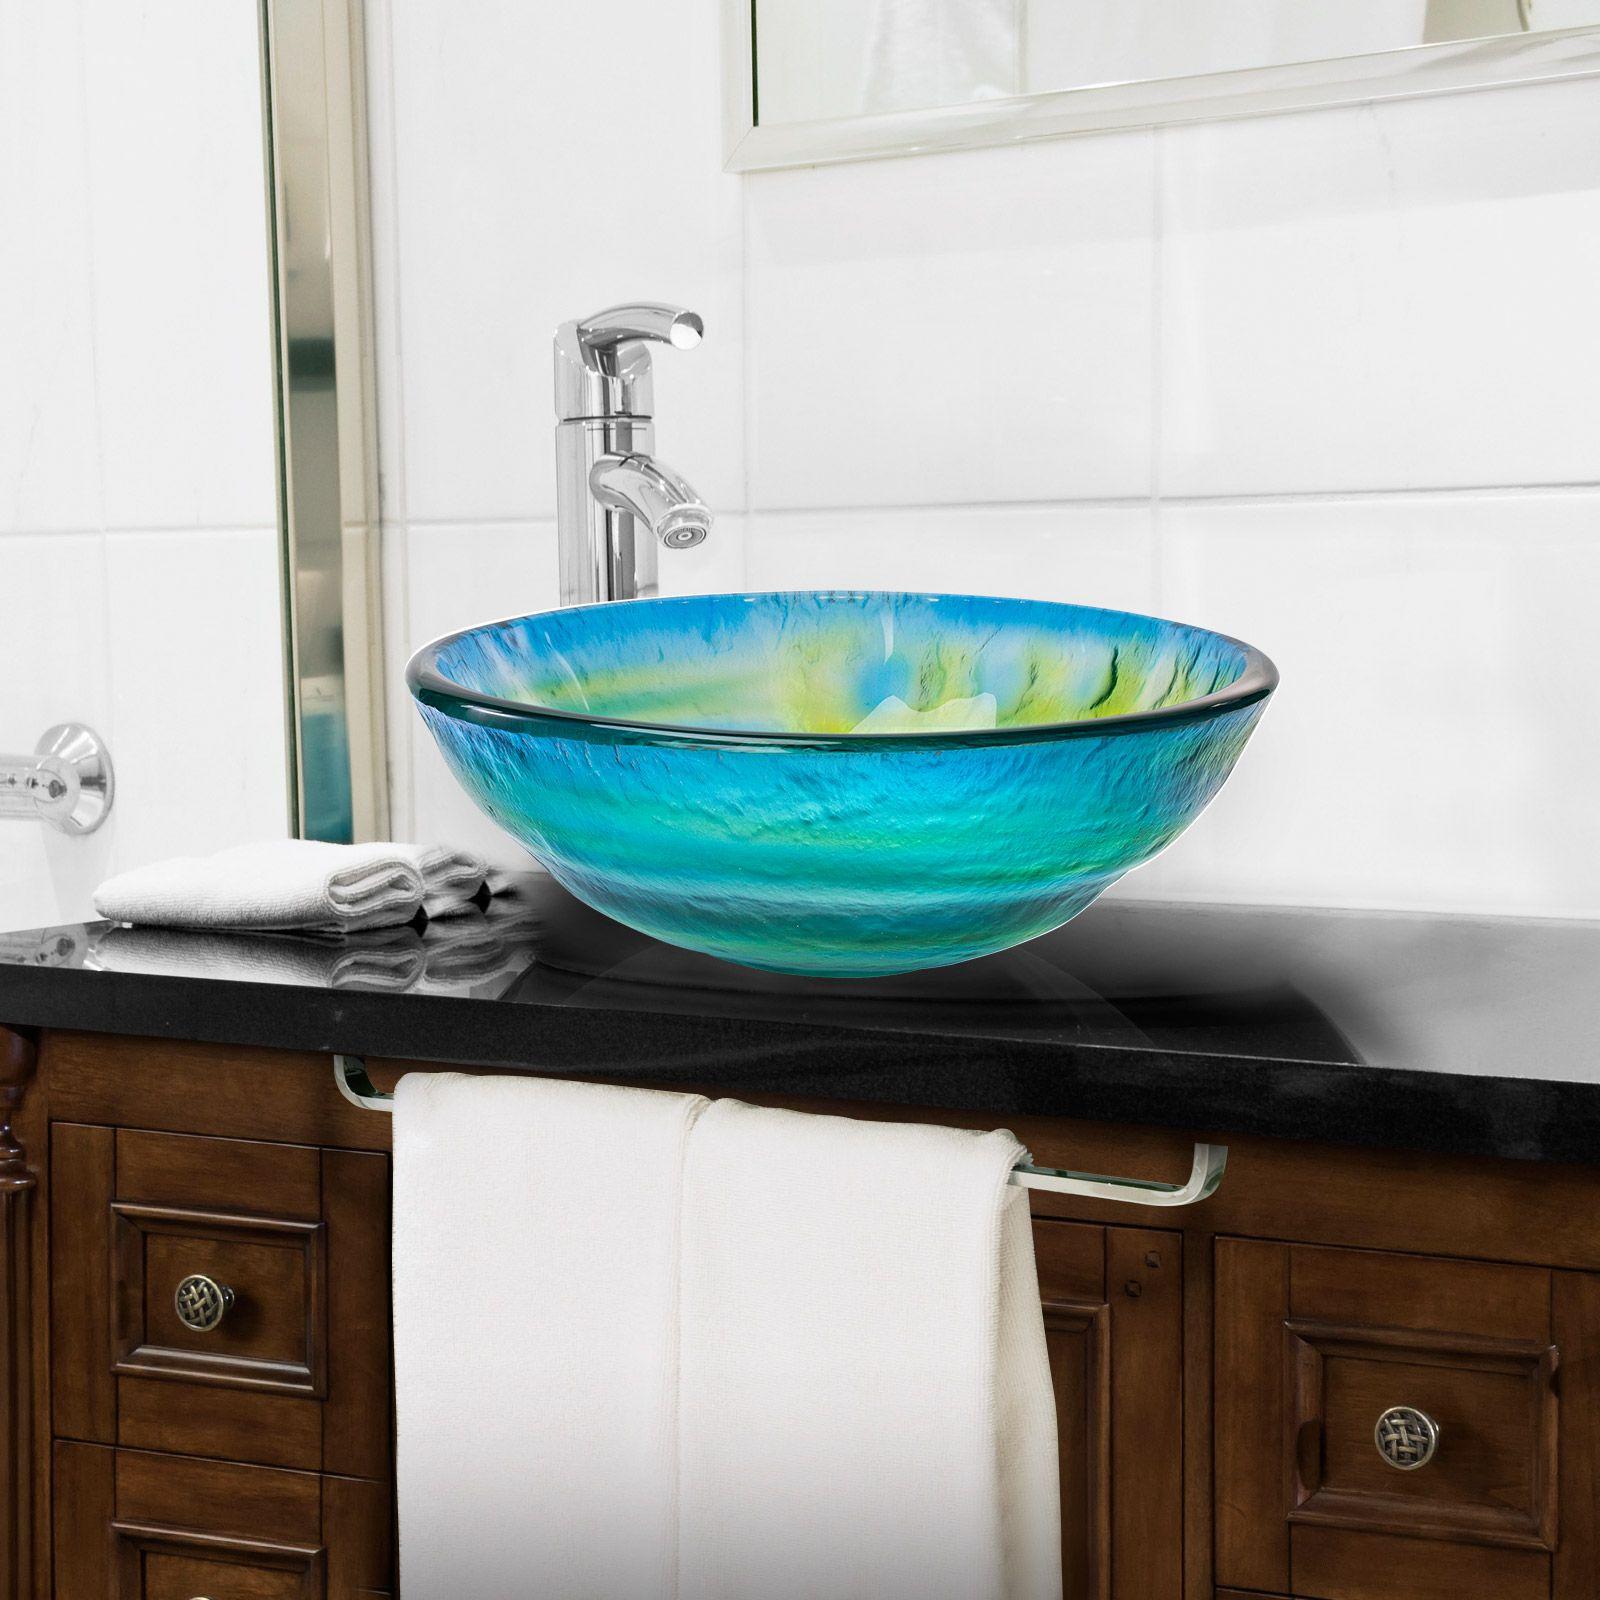 Miligore Modern Glass Vessel Sink Above Counter Bathroom Vanity